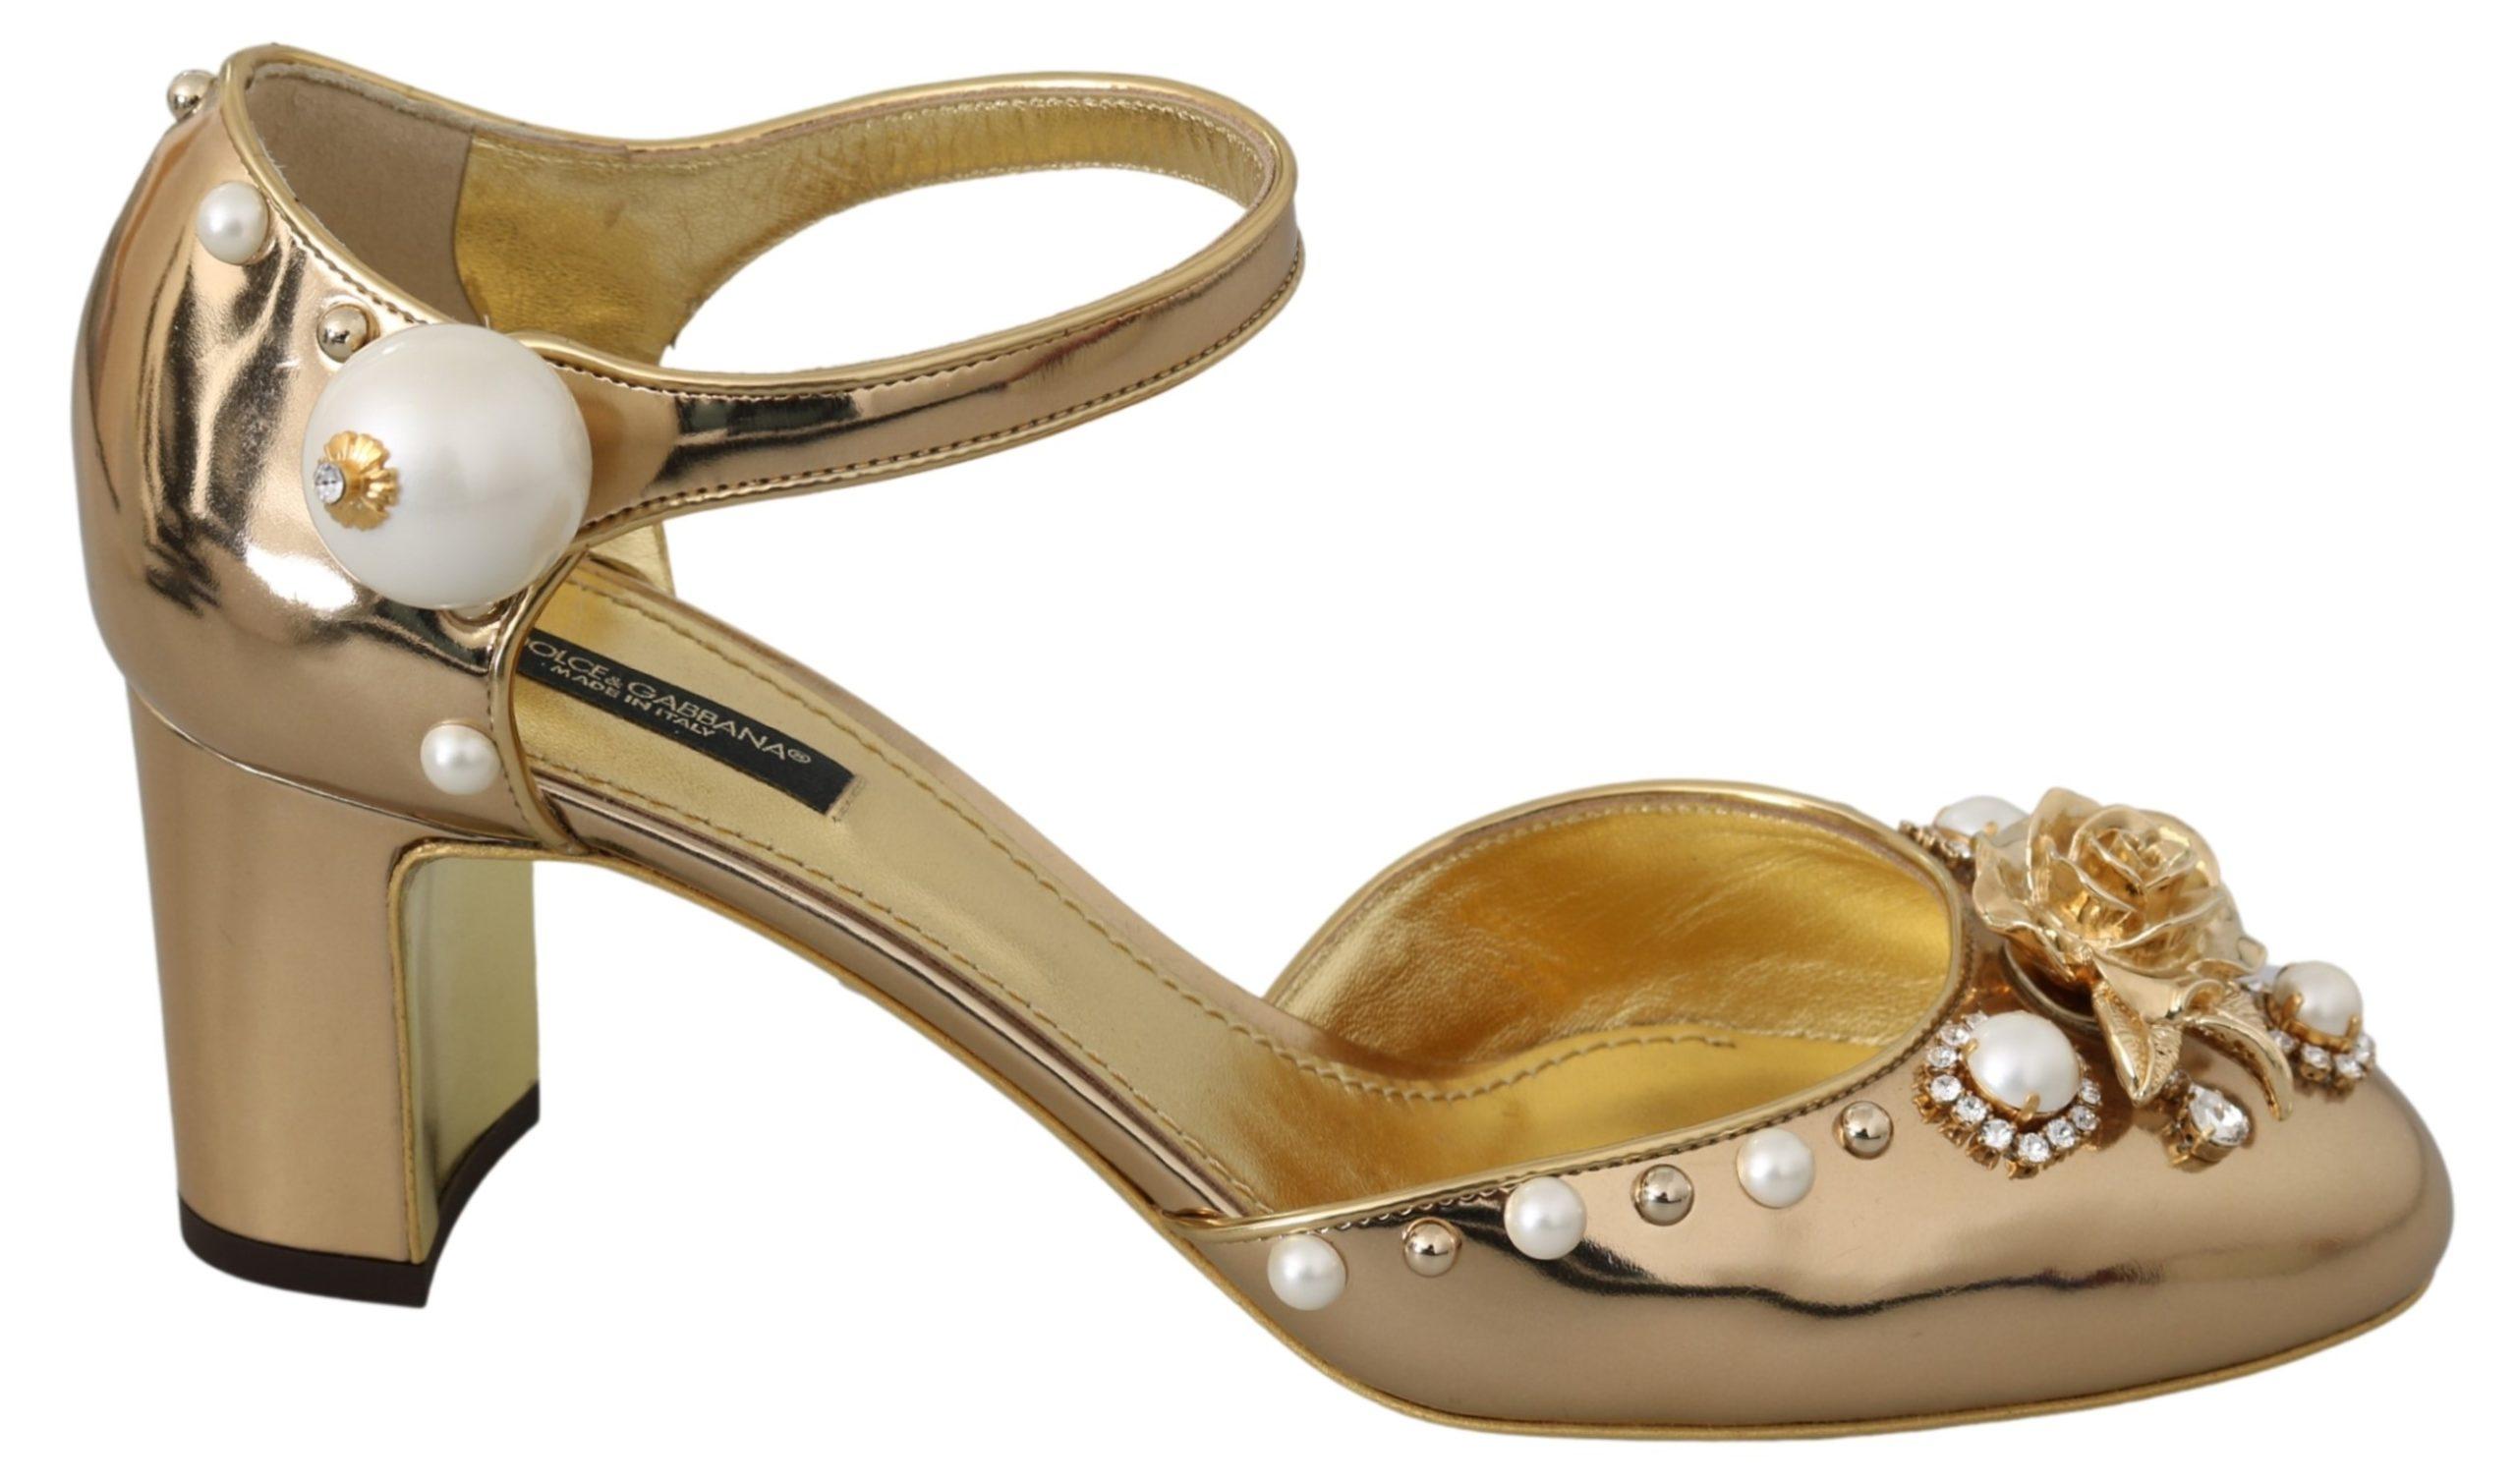 Dolce & Gabbana Women's Pearls Ankle Strap Leather Sandal Gold LA6850 - EU39/US8.5